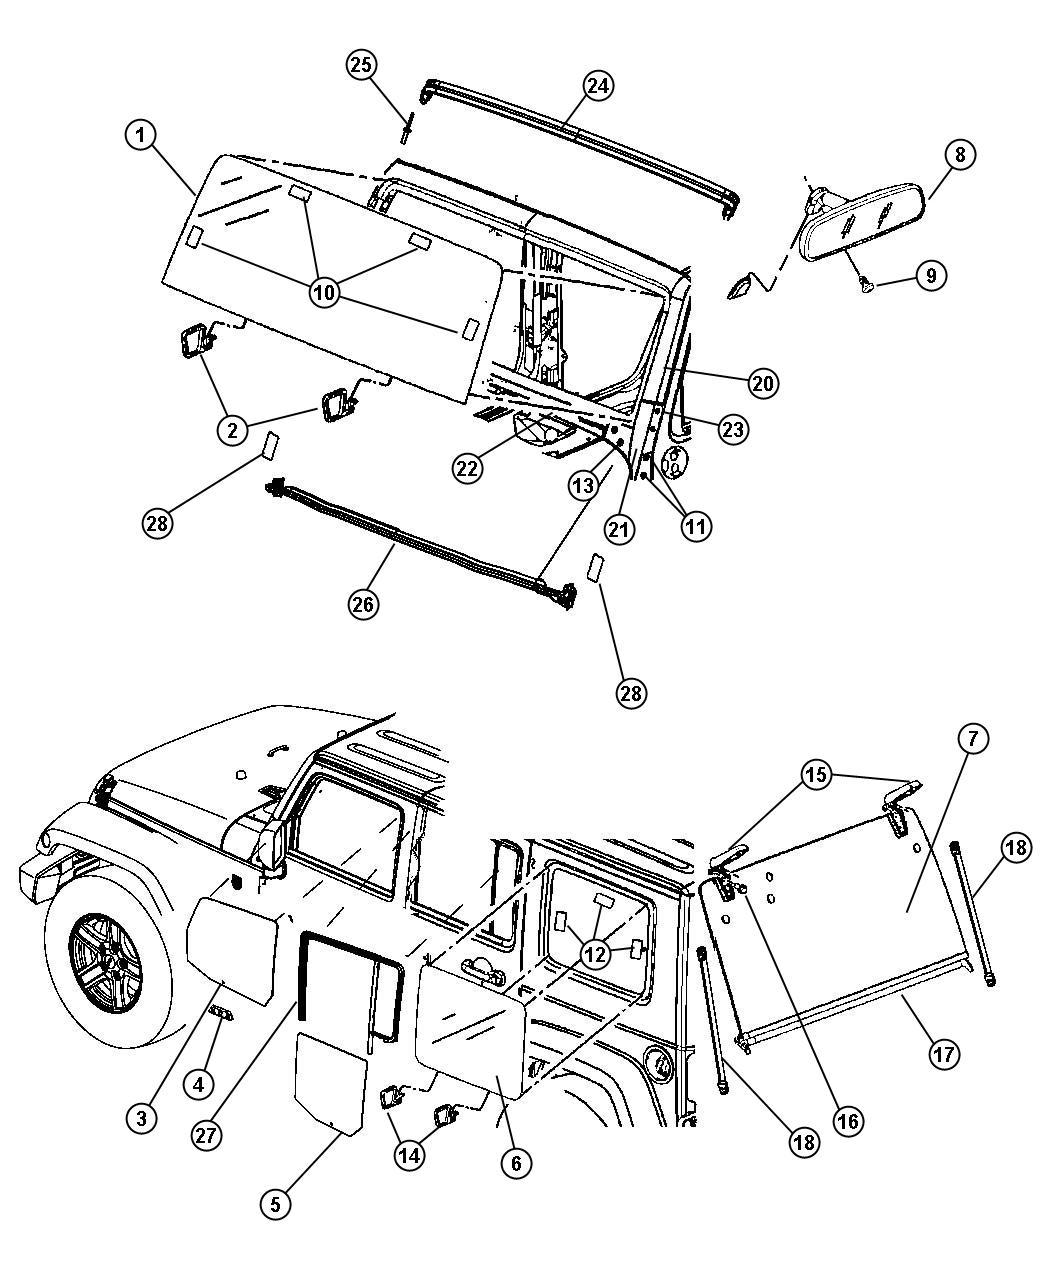 Jeep Wrangler Backlite Includes Hinge Gcd Gfa Vk0 Gcd Mx1 Or Mx3